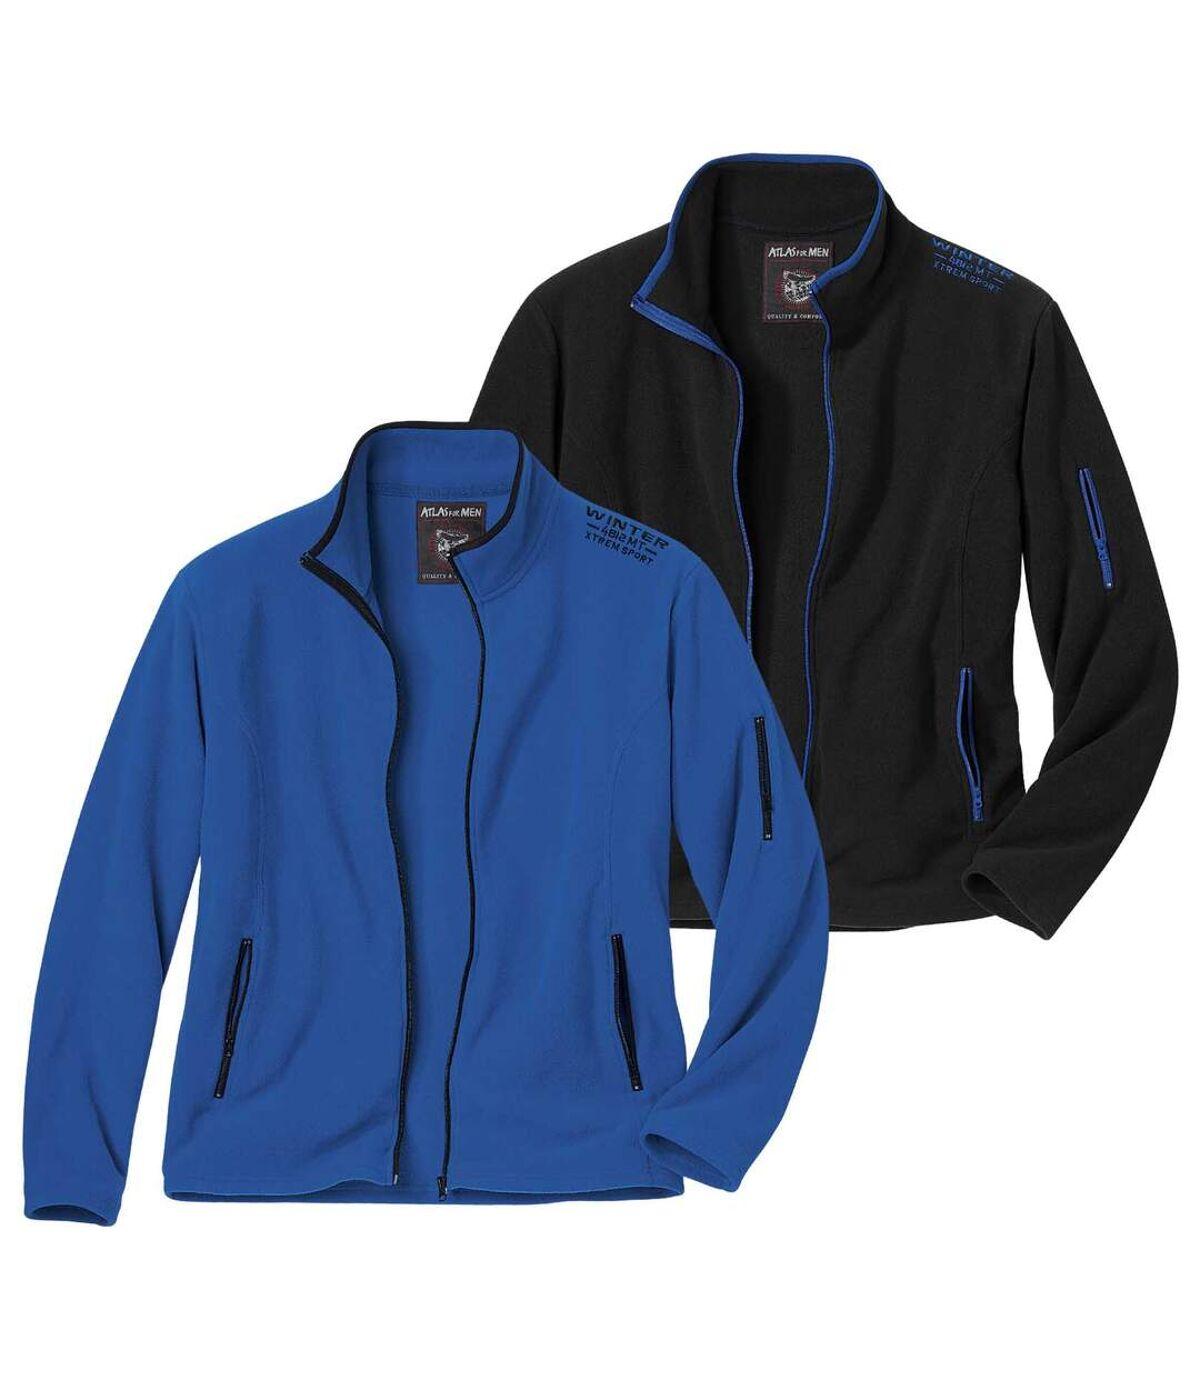 Zestaw 2 bluz z mikropolaru Outdoor Atlas For Men